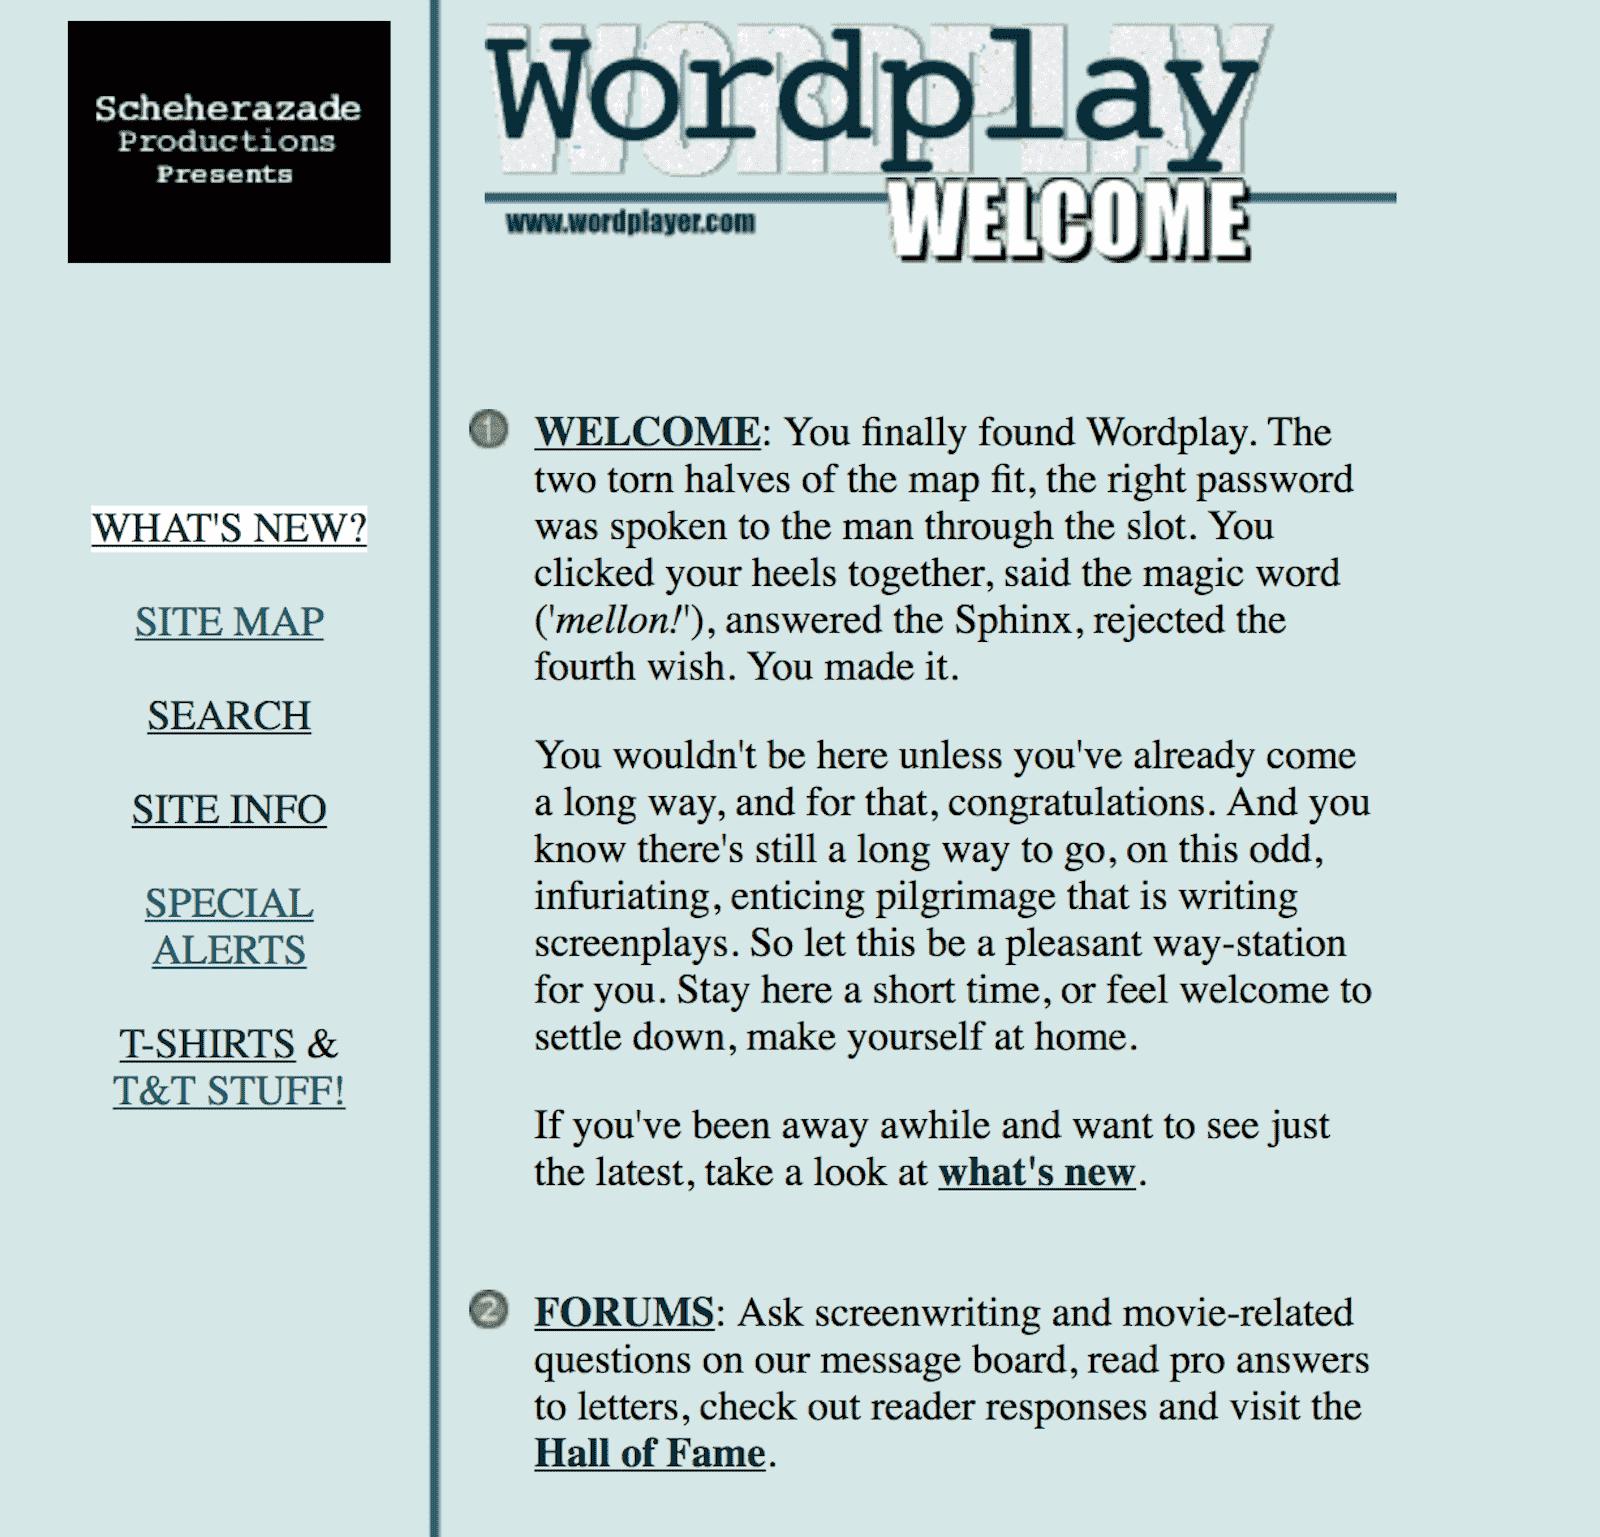 Best Screenwriting Websites - Script Writers - Wordplayer Terry Rossio